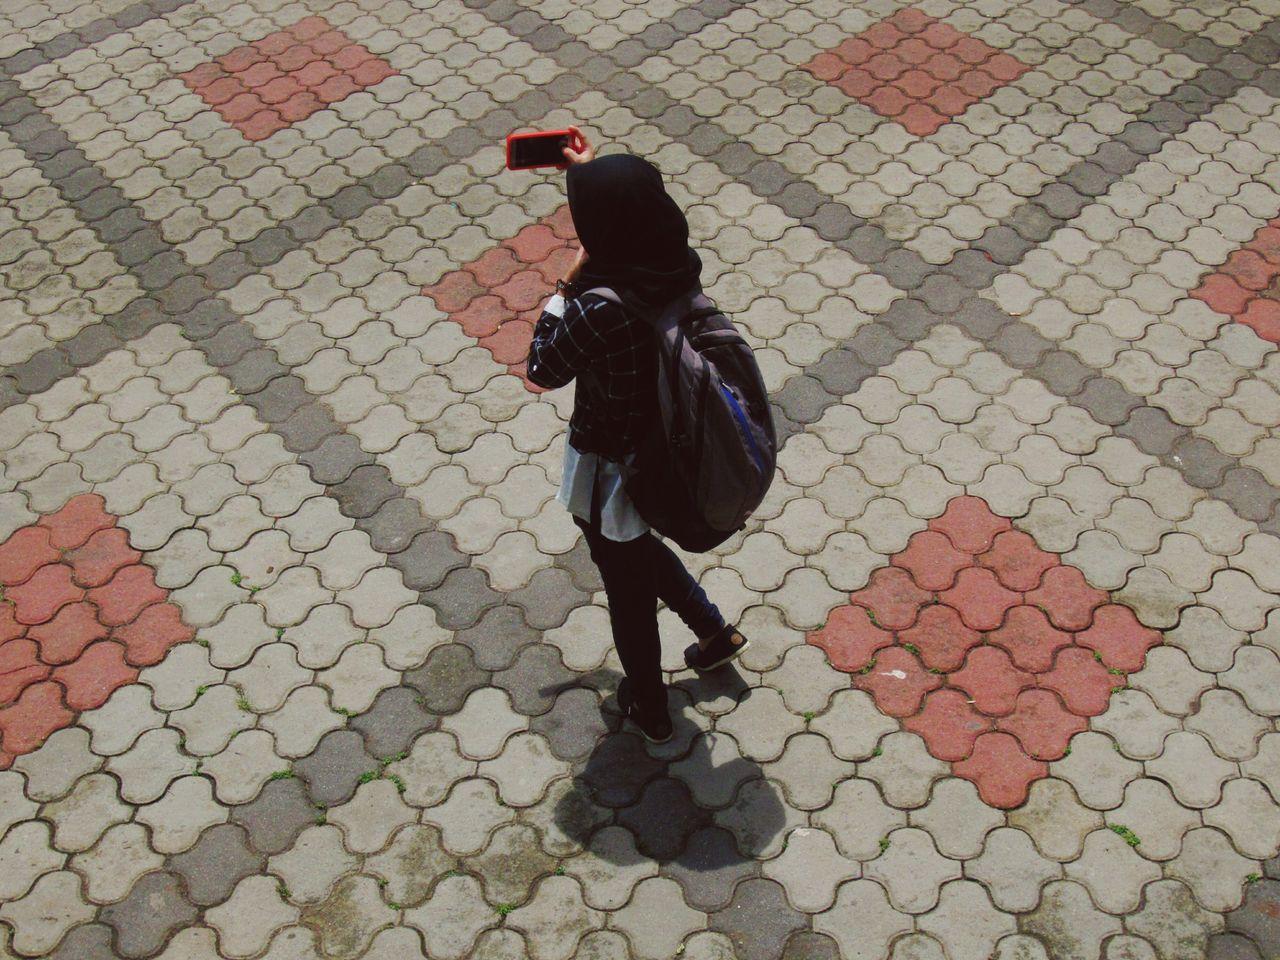 One Person Full Length One Woman Only Outdoors Selfie Taking Photos Taking Pictures Taking Selfies Burqa Jilbab Jilbab Traveler